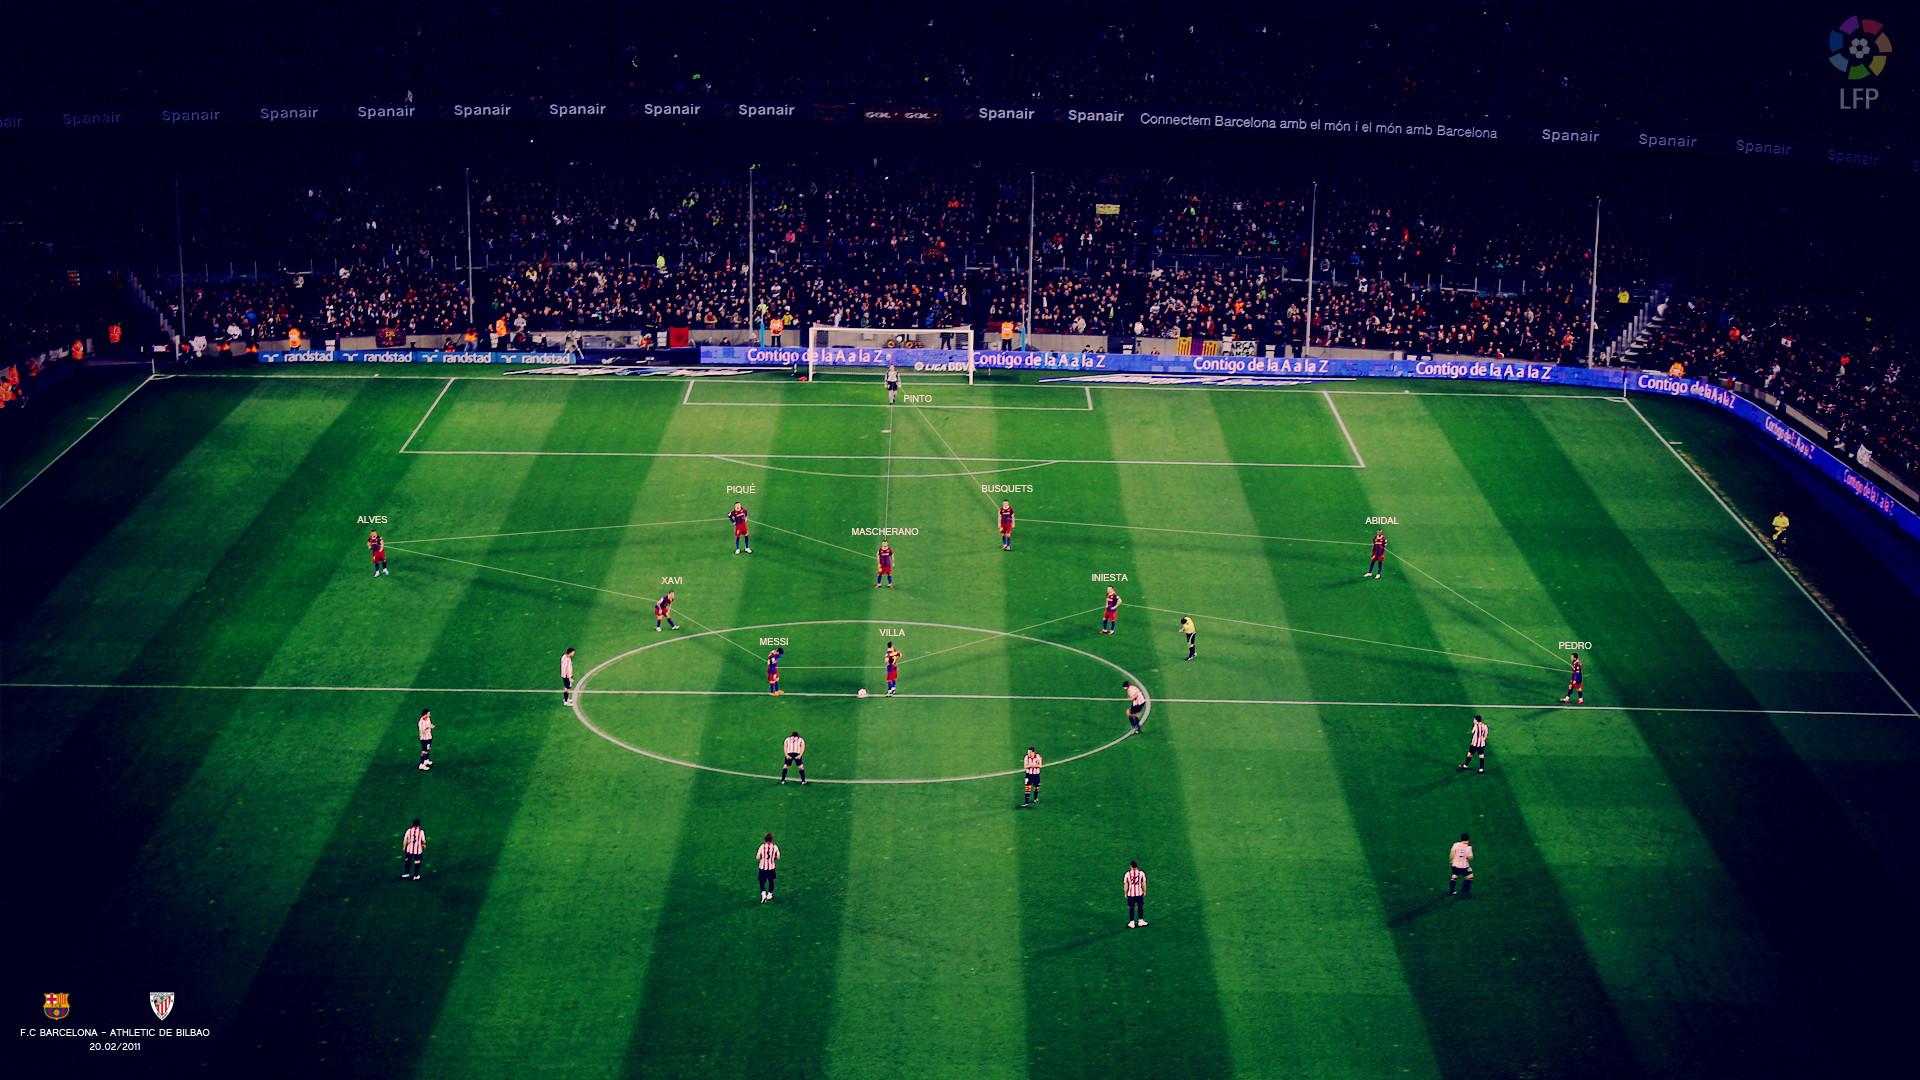 Soccer Field Stadium barcelona wallpaper | | 125448 | WallpaperUP